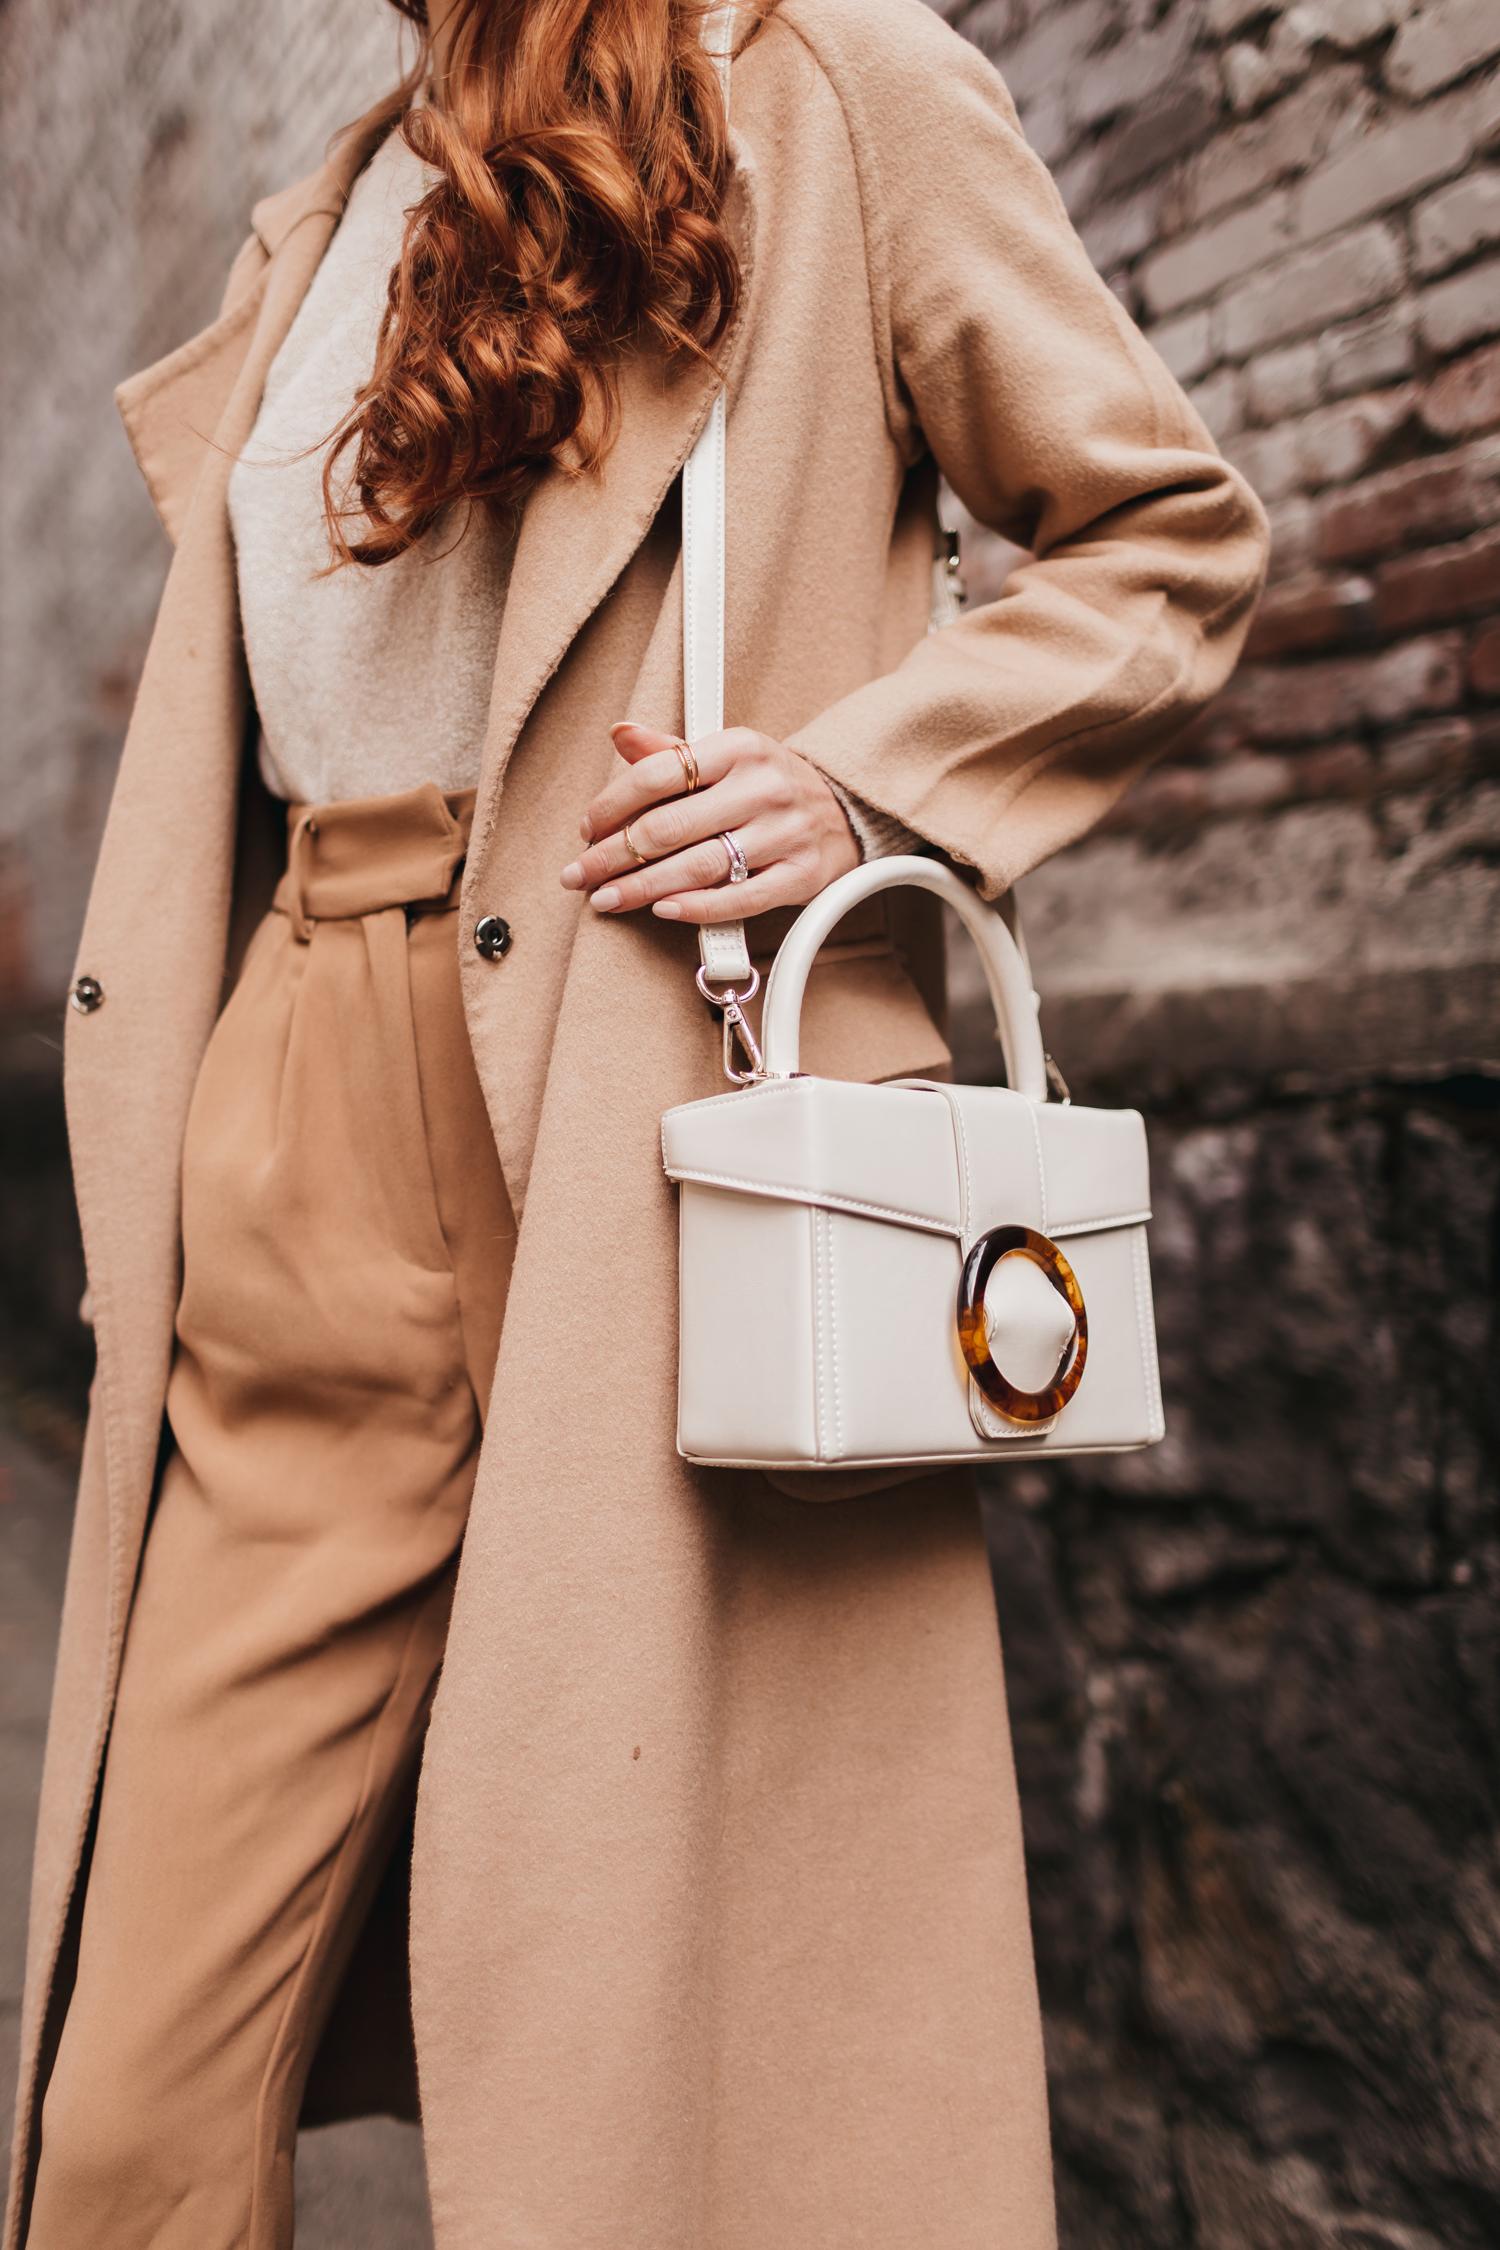 Neutral Outfit Camel White Biege Neutrals Coat Capsule Wardrobe Monochrome